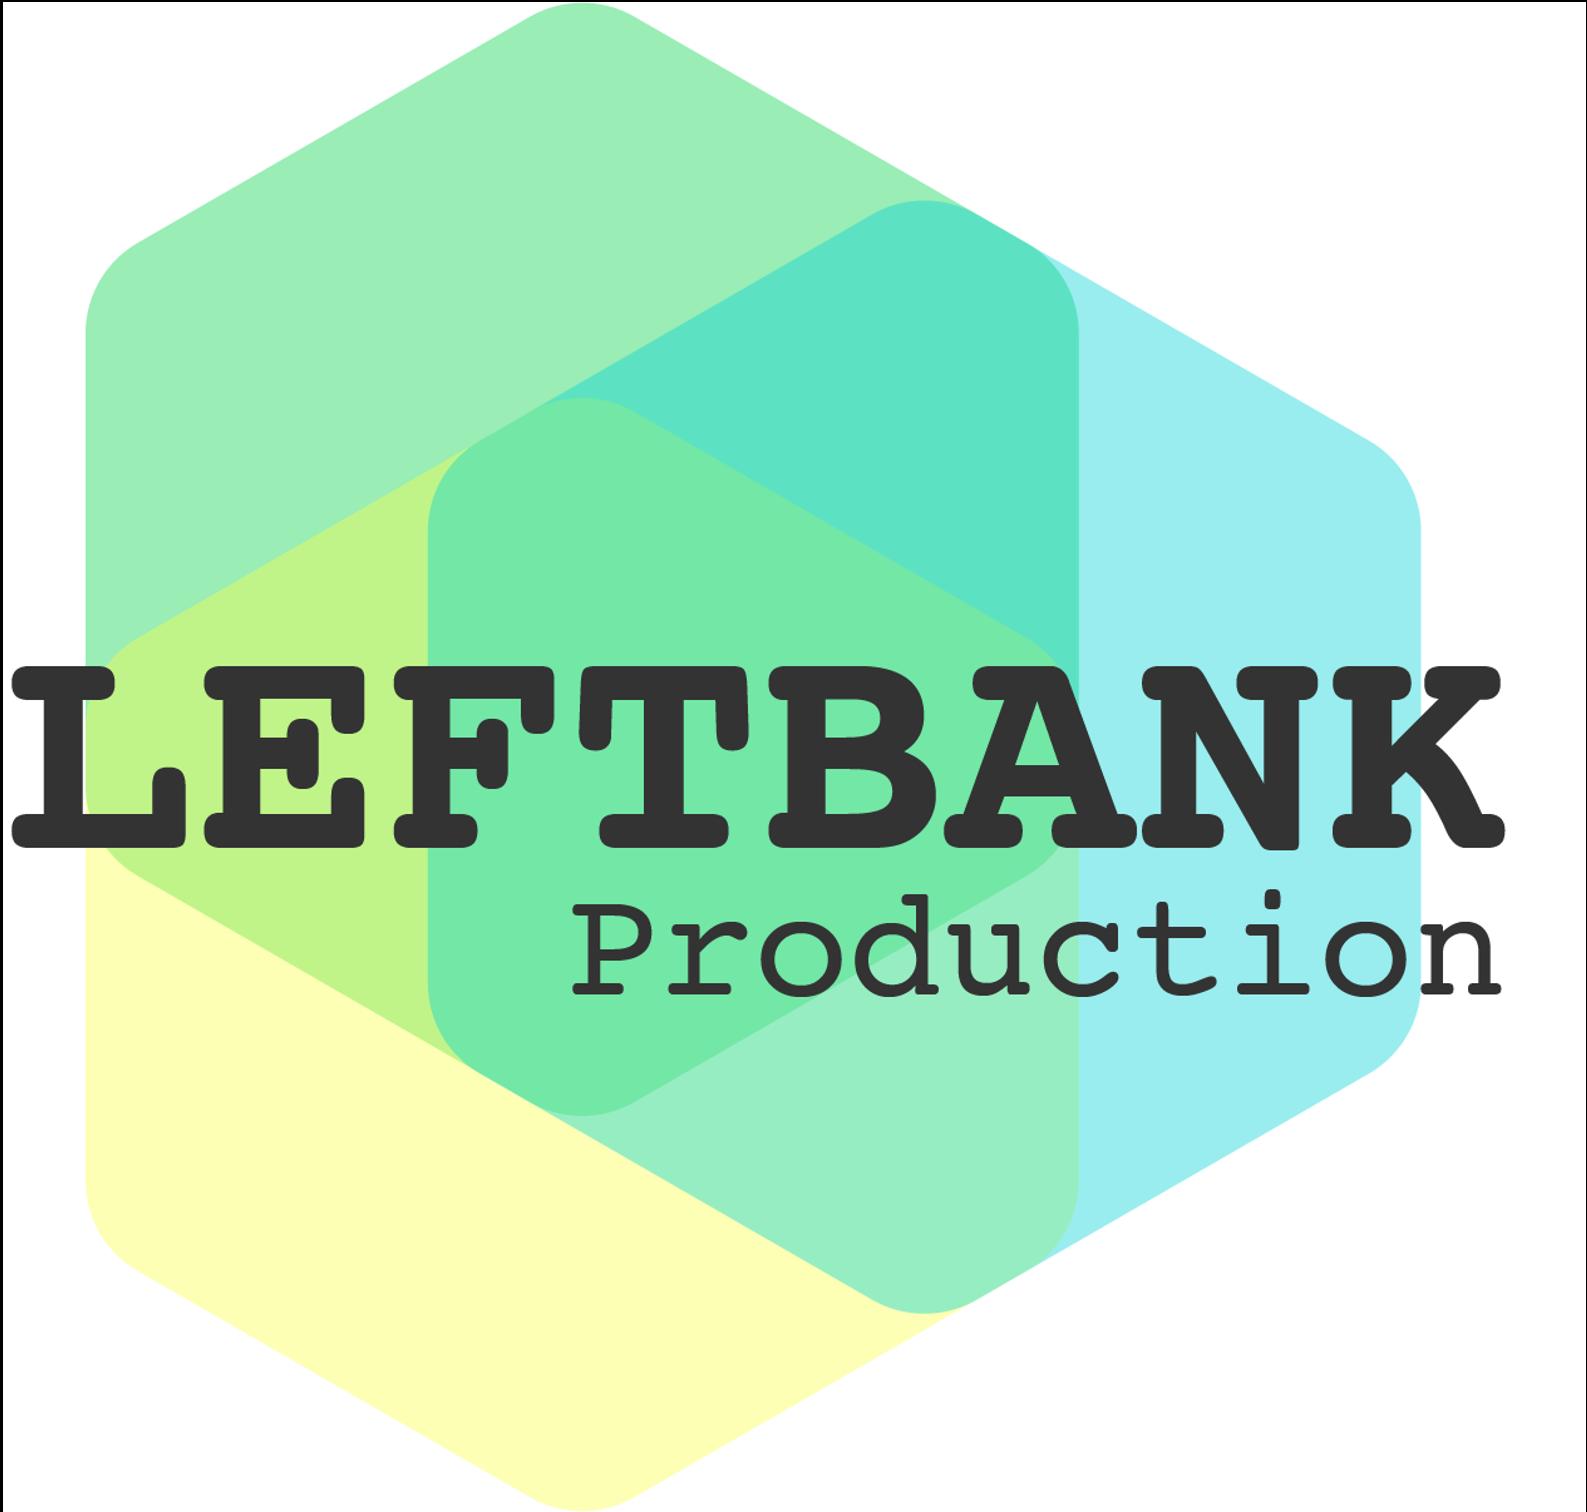 LeftBank Production